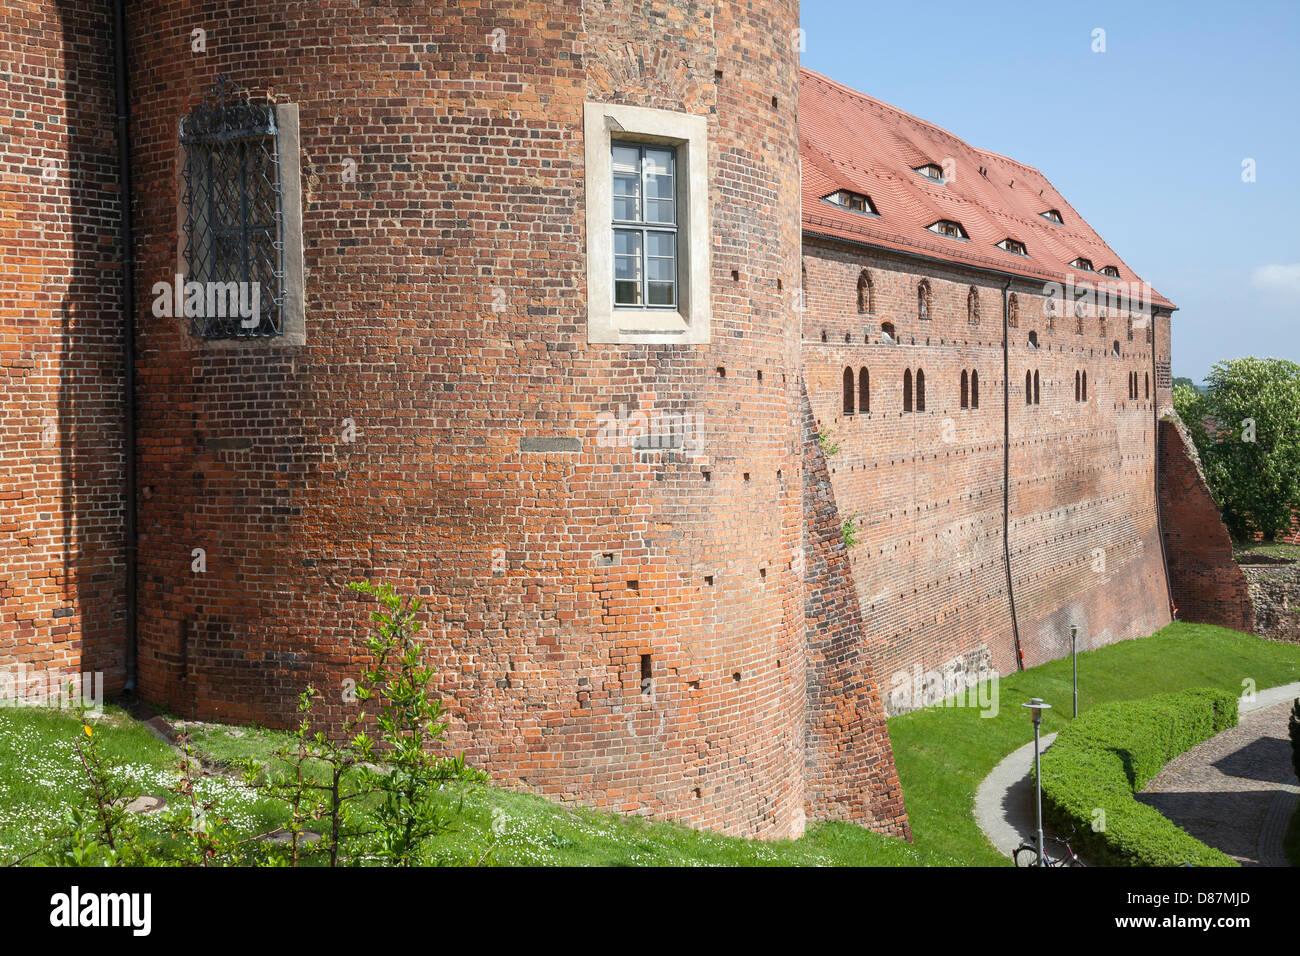 BurgEisenhardt, Bad Belzig, Hoher Fläming, Brandenburg, Germany - Stock Image